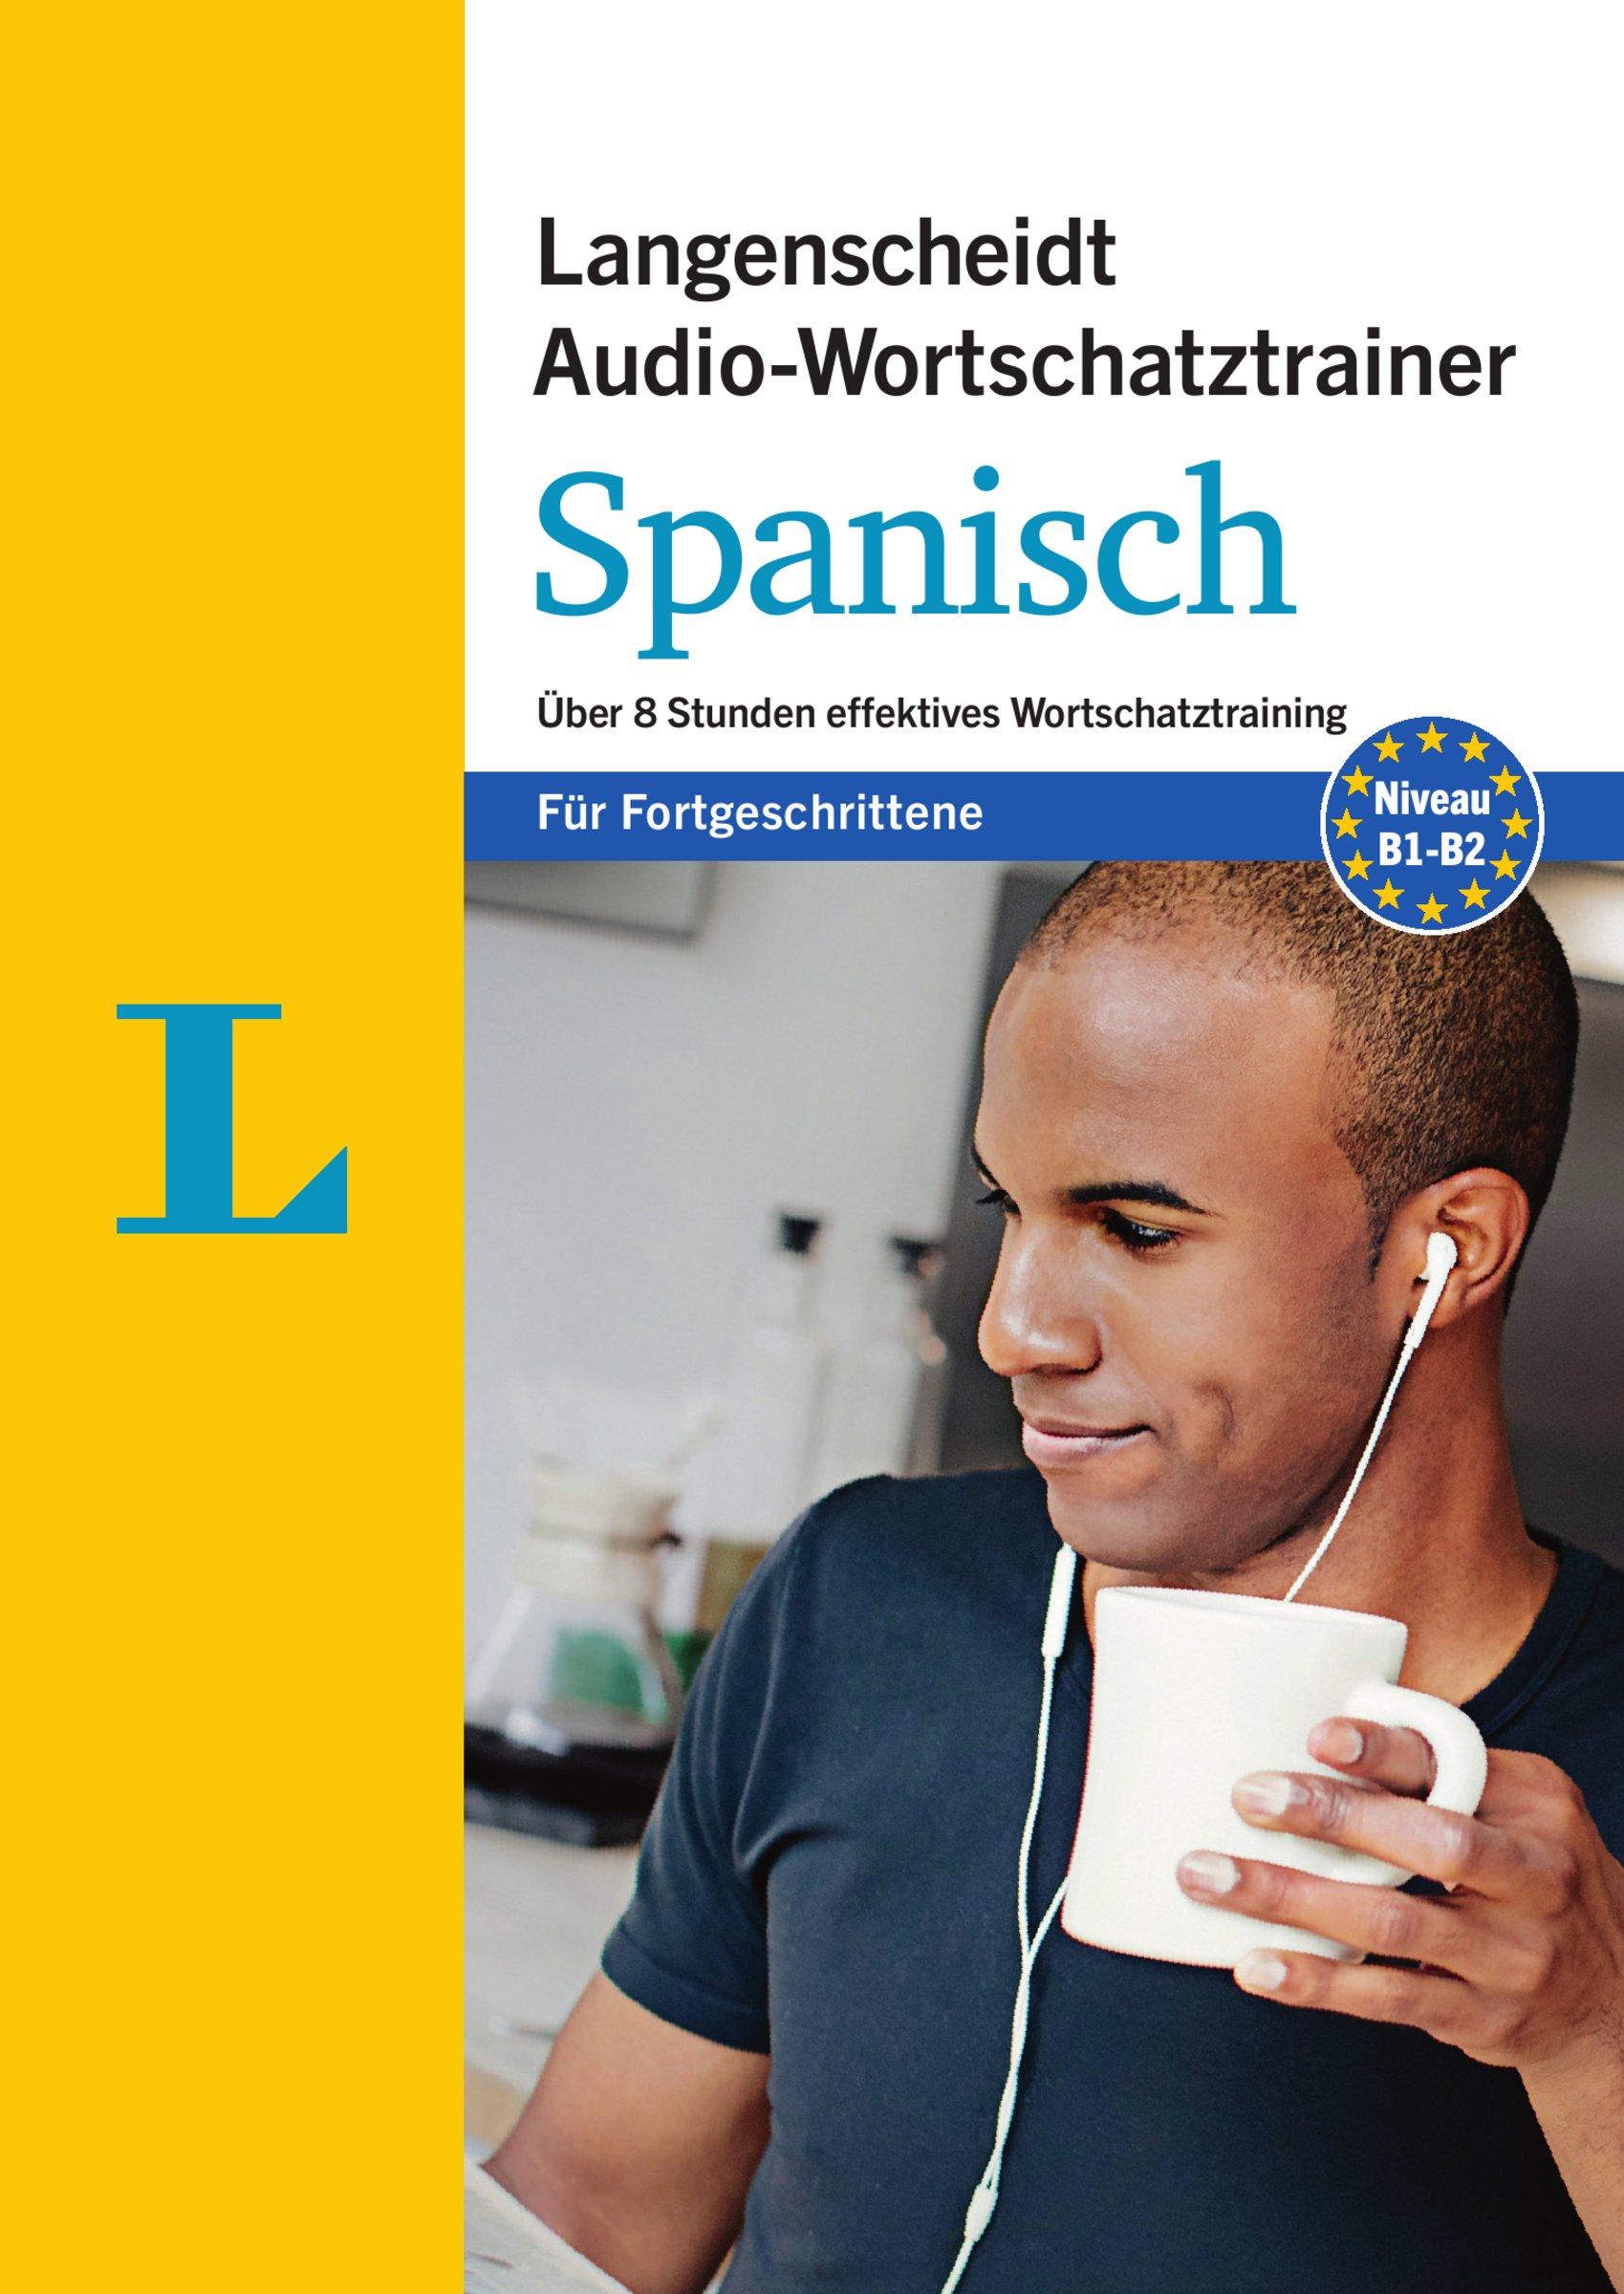 langenscheidt-audio-wortschatztrainer-spanisch-fr-fortgeschrittene-fr-fortgeschrittene-ber-8-stunden-effektives-wortschatztraining-langenscheidt-audio-wortschatztrainer-fr-fortgeschrittene